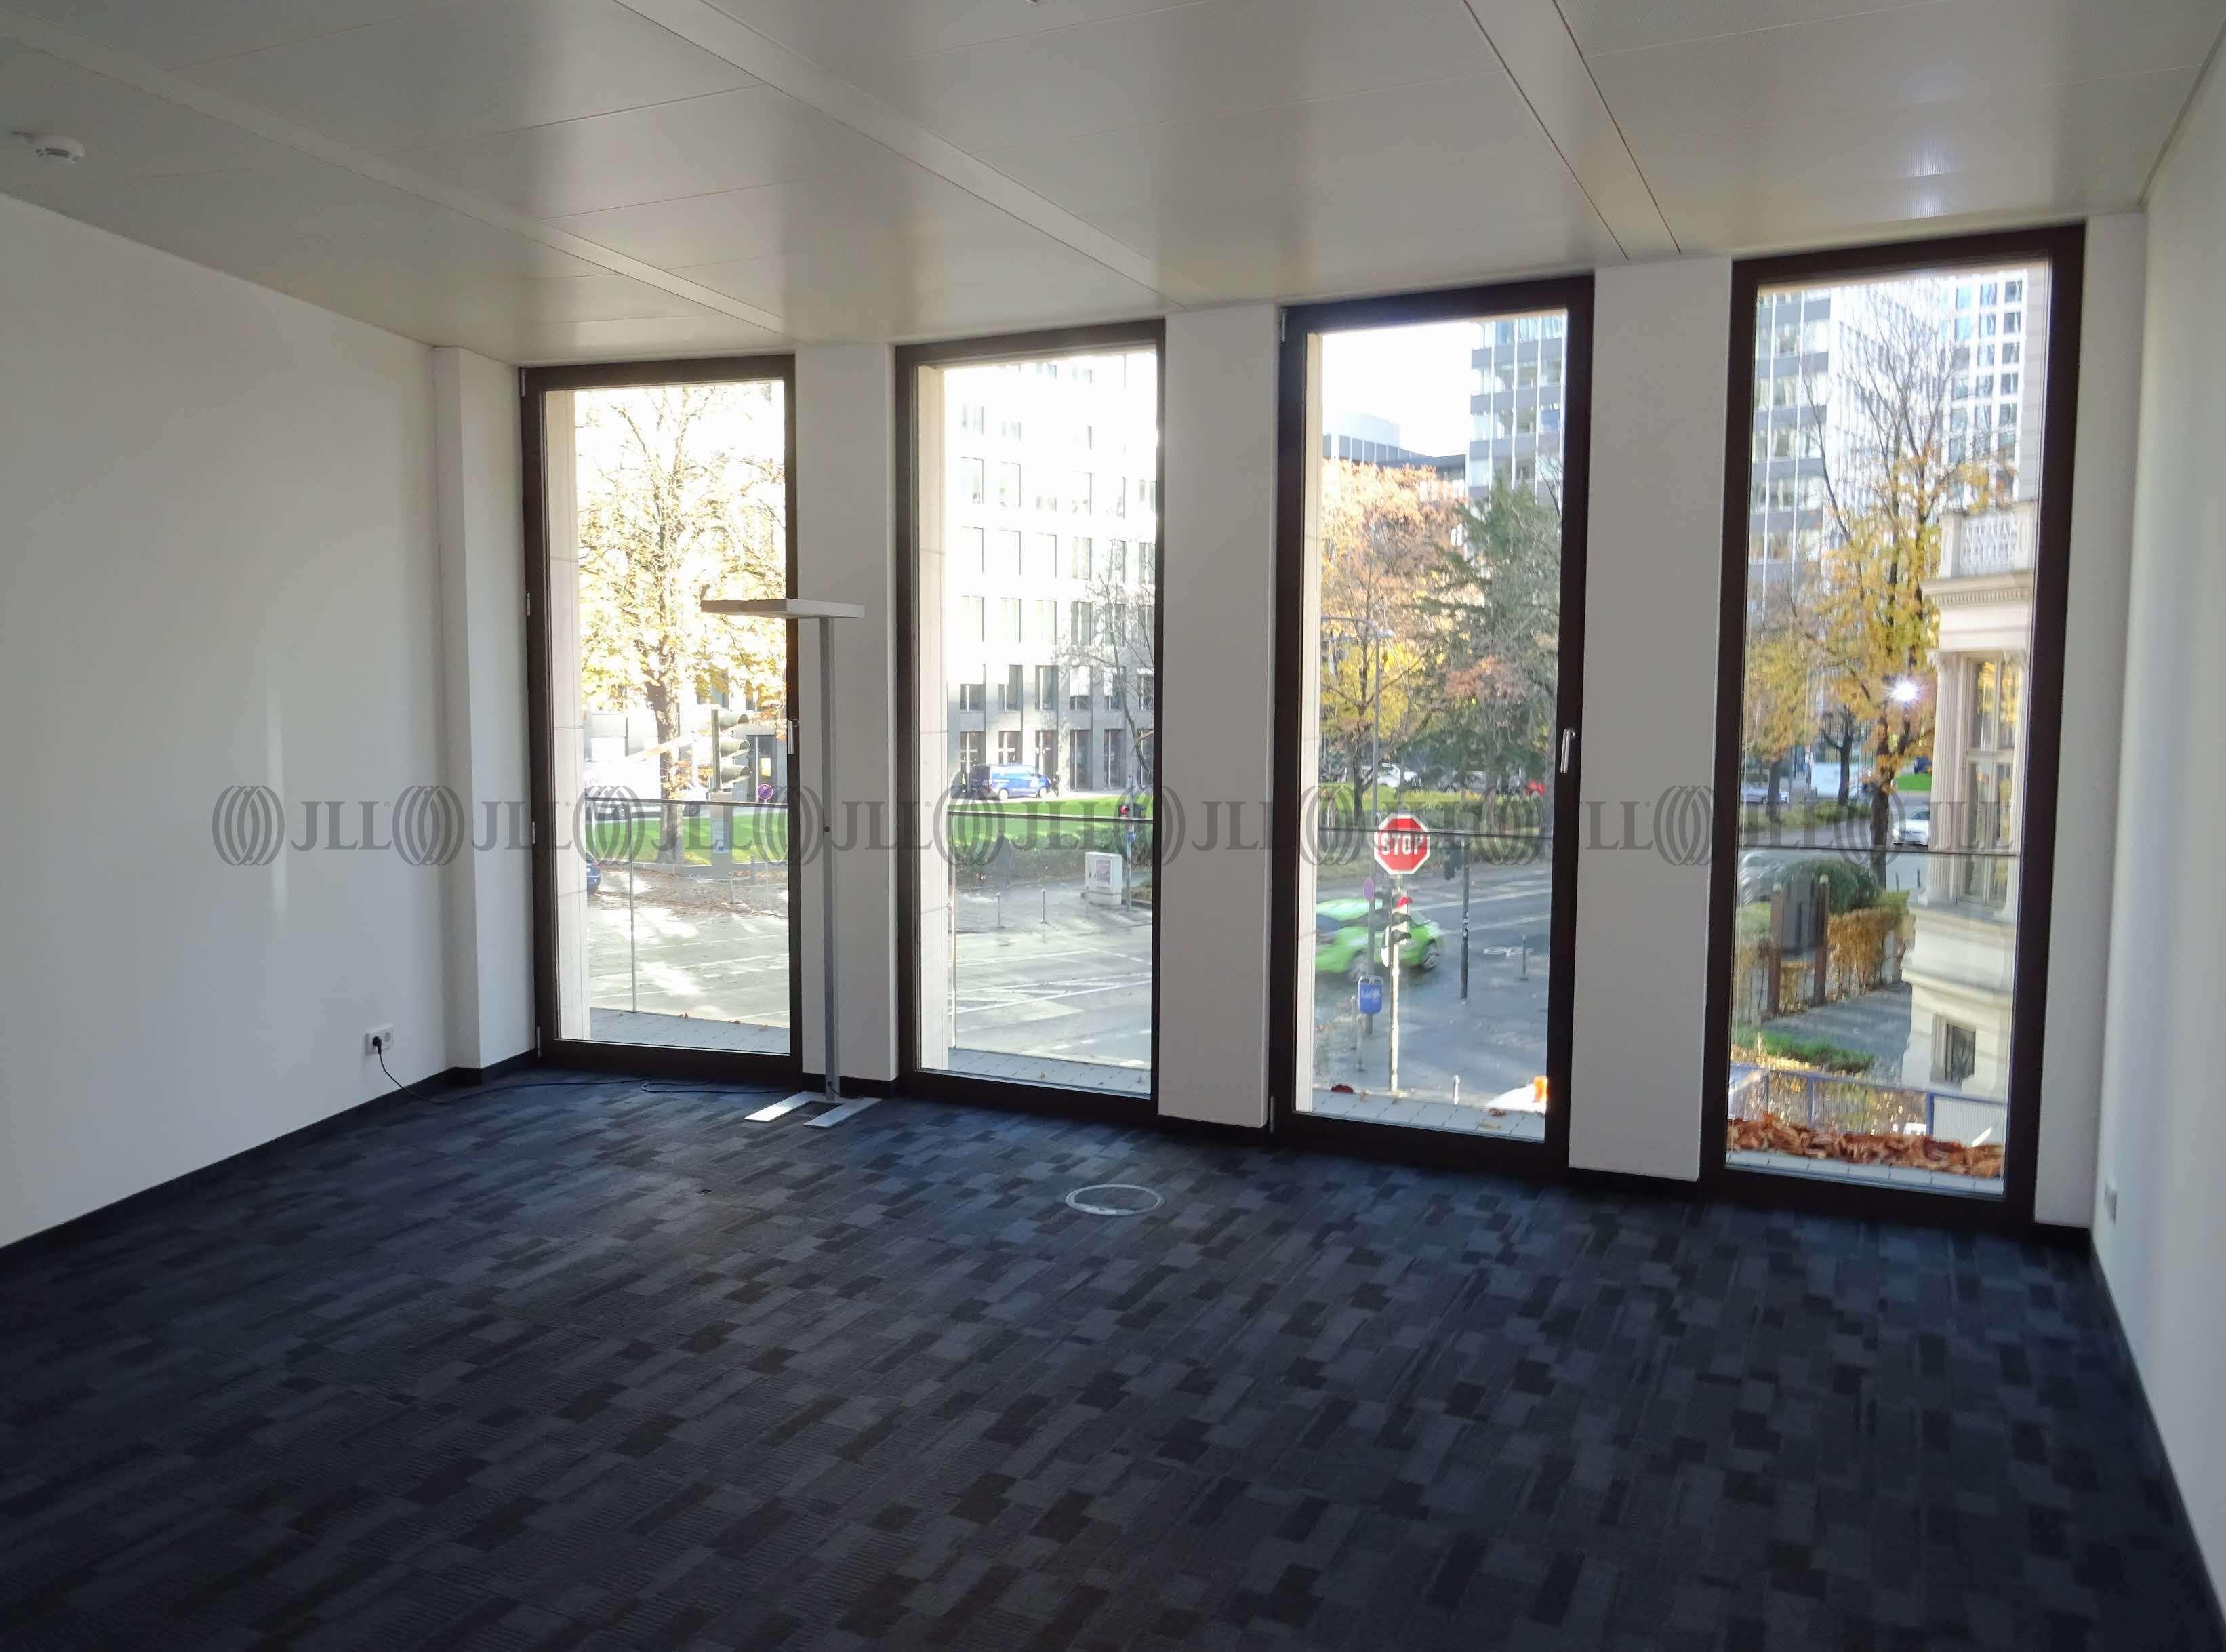 Büros Frankfurt am main, 60325 - Büro - Frankfurt am Main, Westend-Süd - F0187 - 9772746